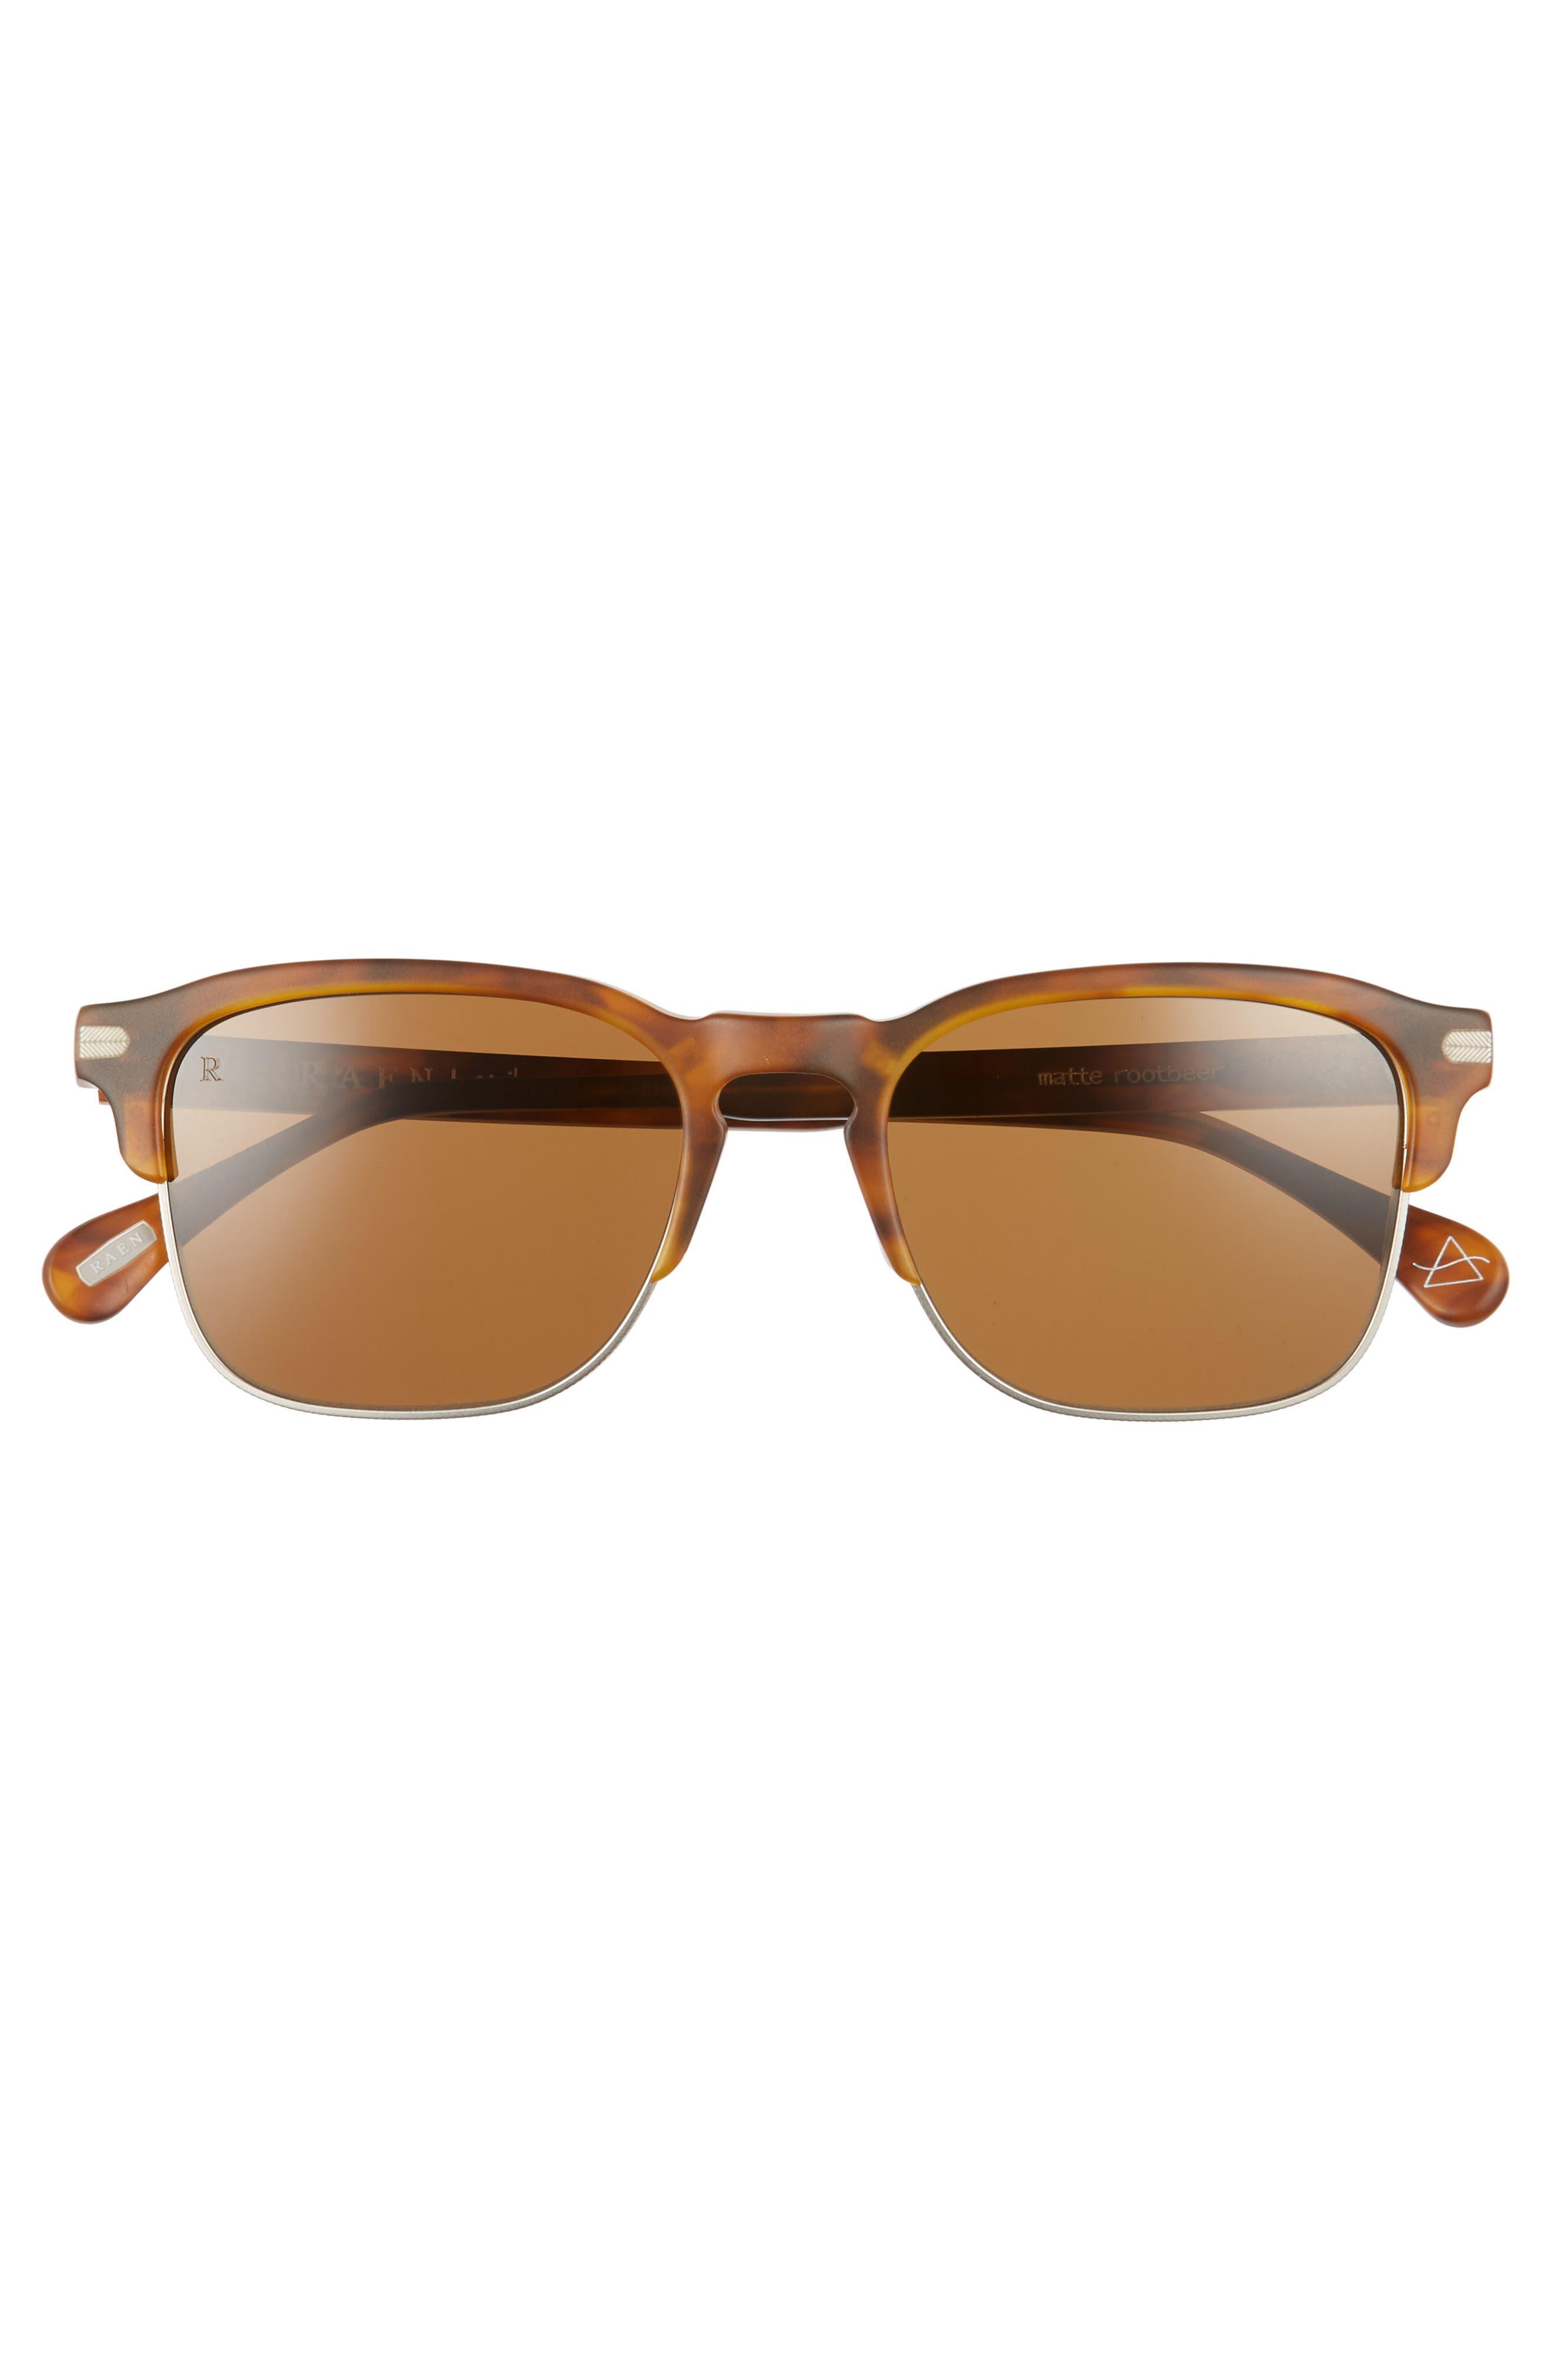 Wiley A 53mm Sunglasses,                             Alternate thumbnail 2, color,                             AMERICANO